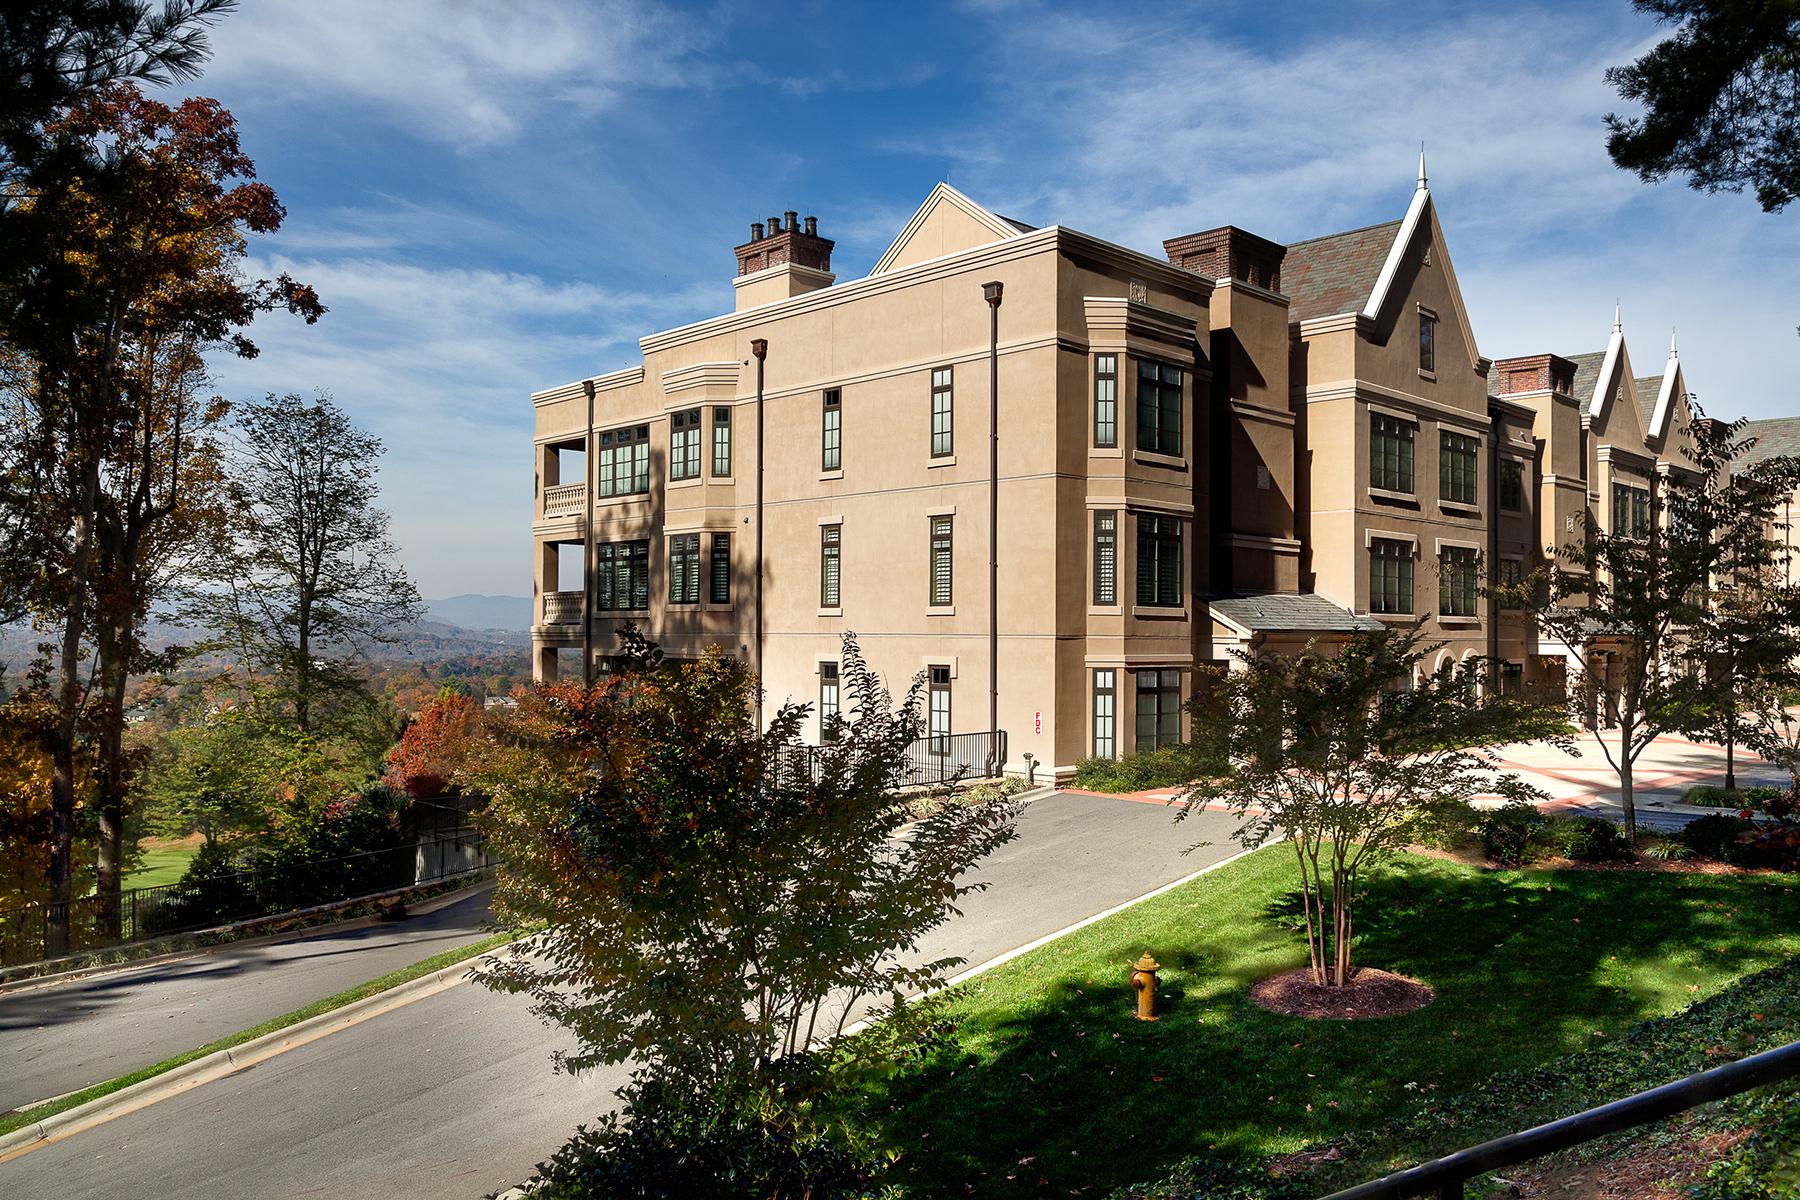 Condominium for Sale at THE FITZGERALD 288 Macon Ave, Asheville, North Carolina 28804 United States